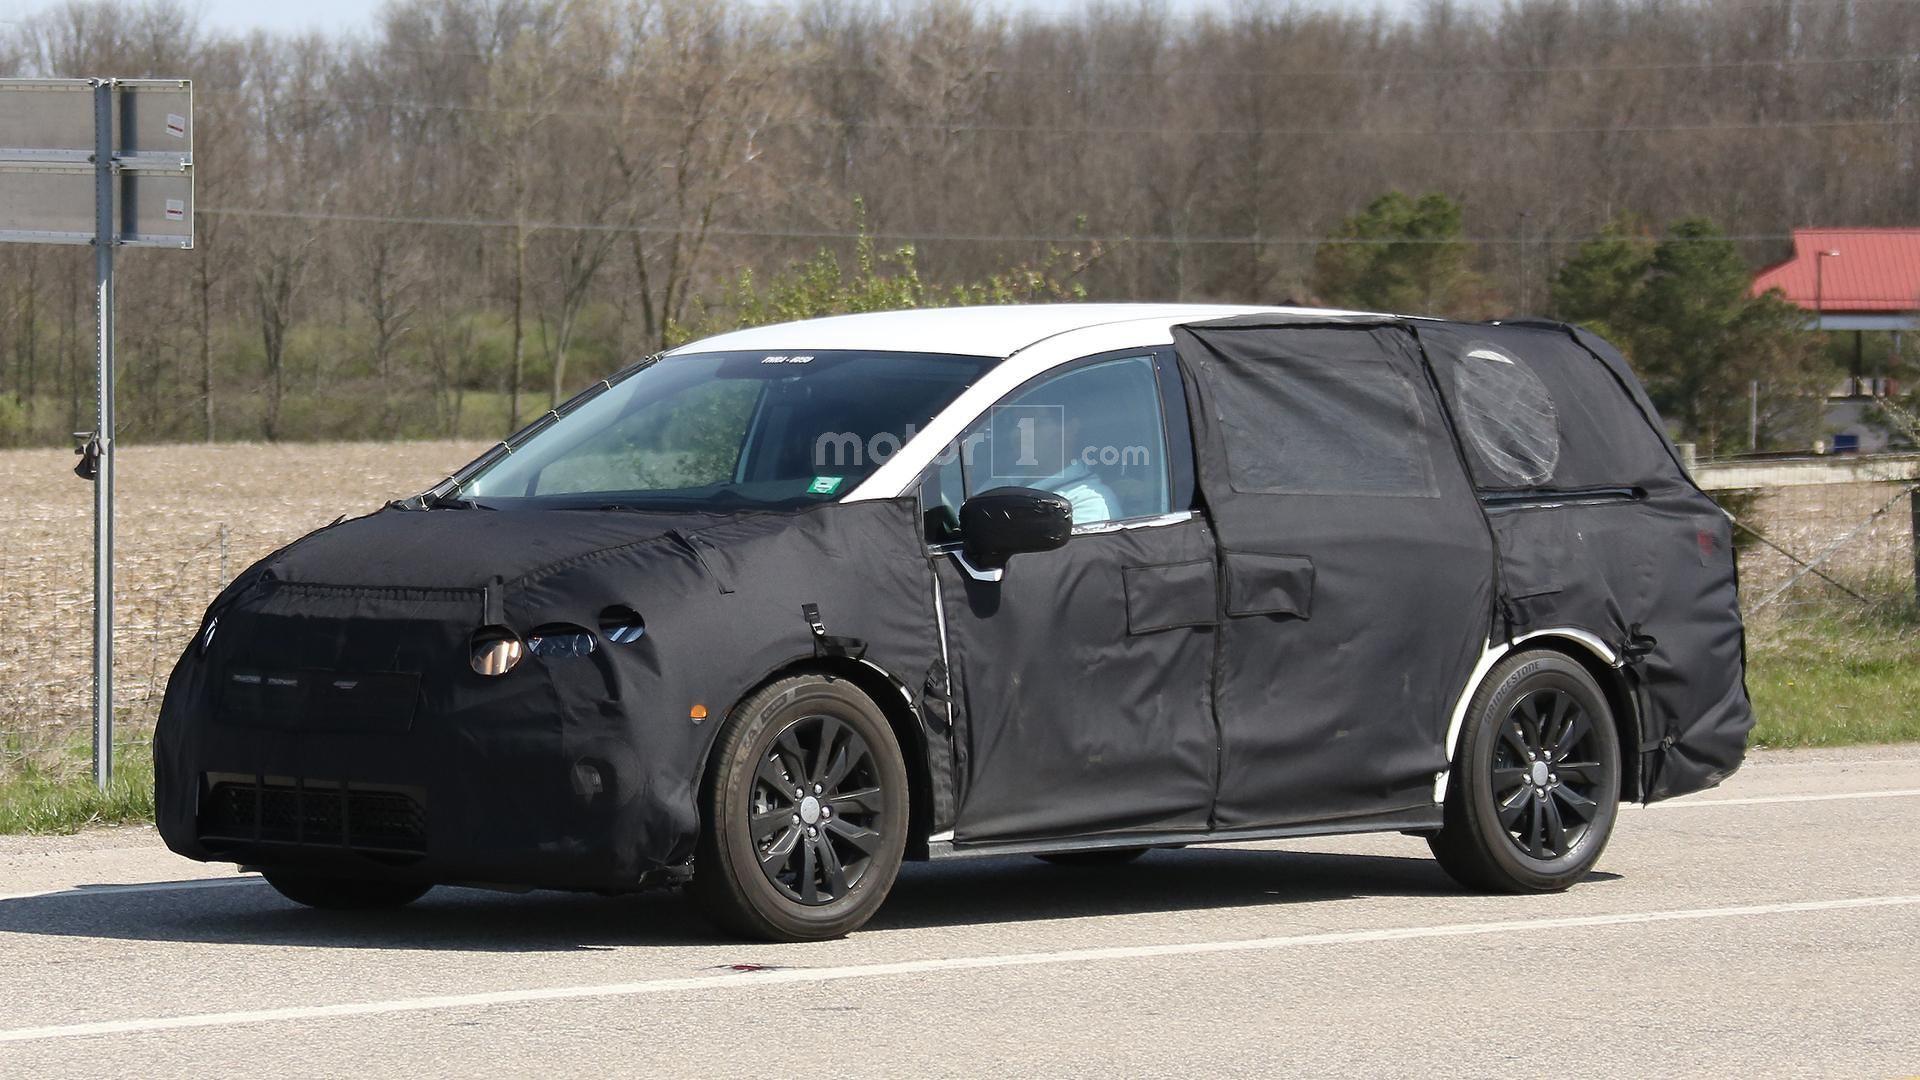 2017 Honda Odyssey spied testing in Ohio